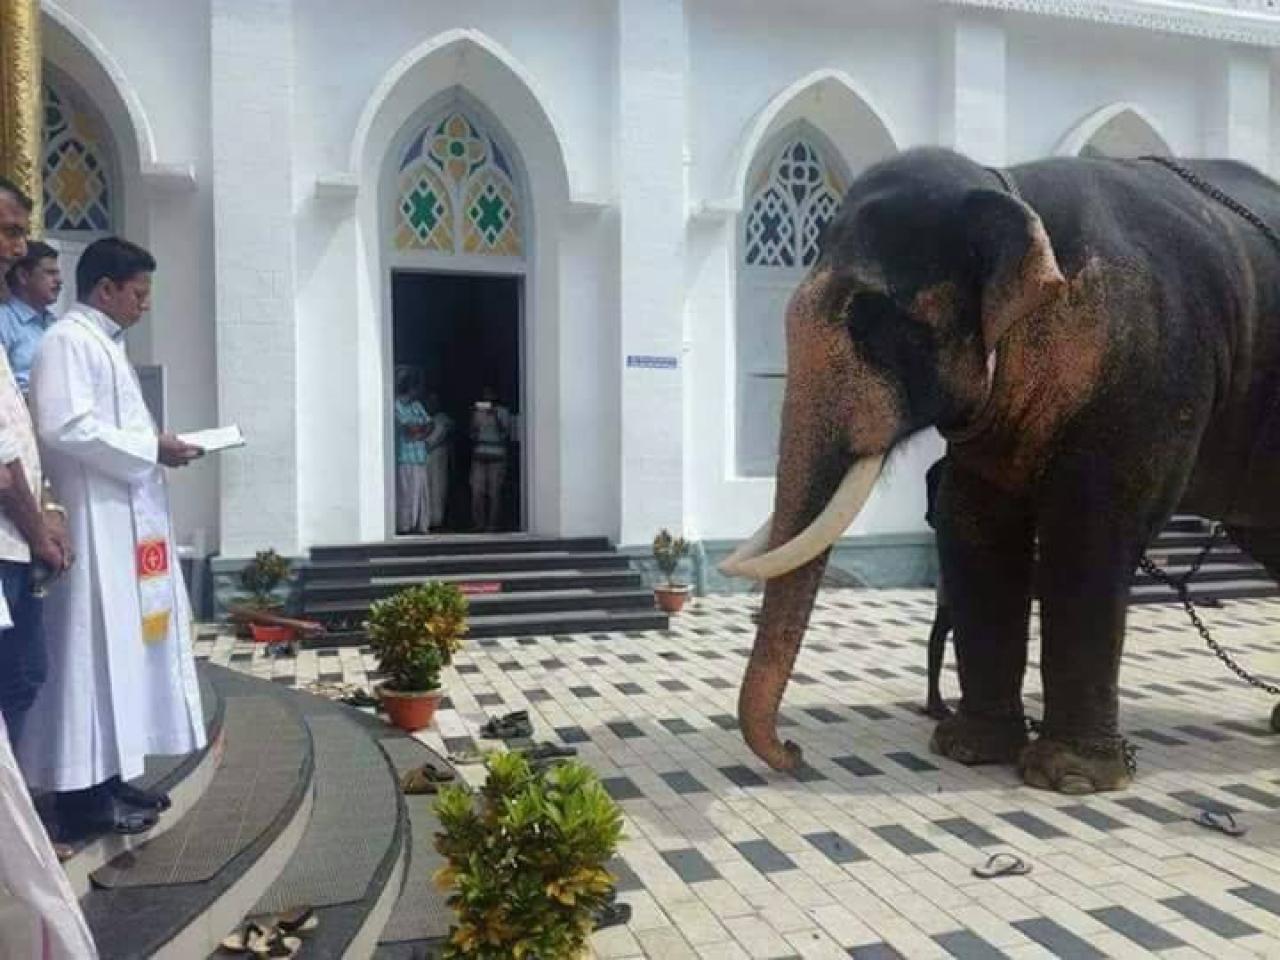 Baptising an elephant?